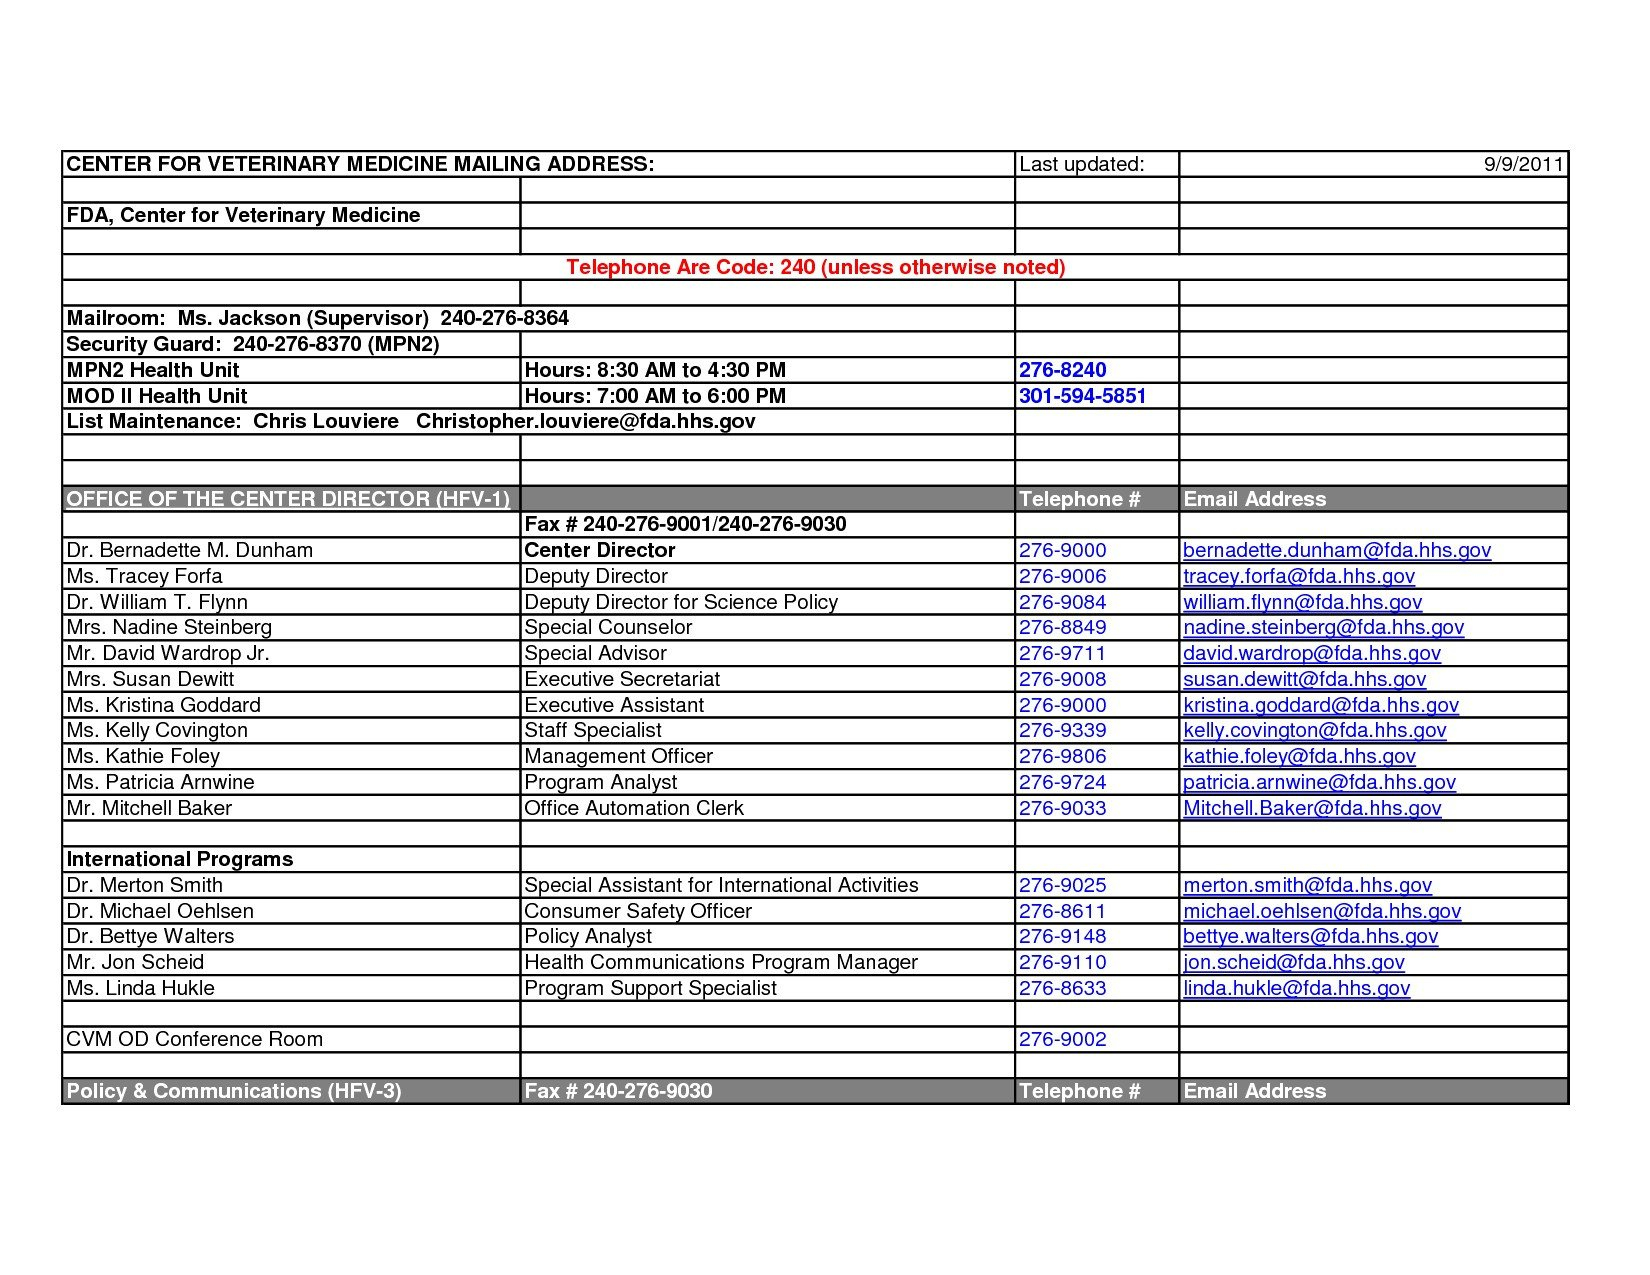 Cd Ladder Spreadsheet – Spreadsheet Collections Regarding Cd Ladder Excel Spreadsheet